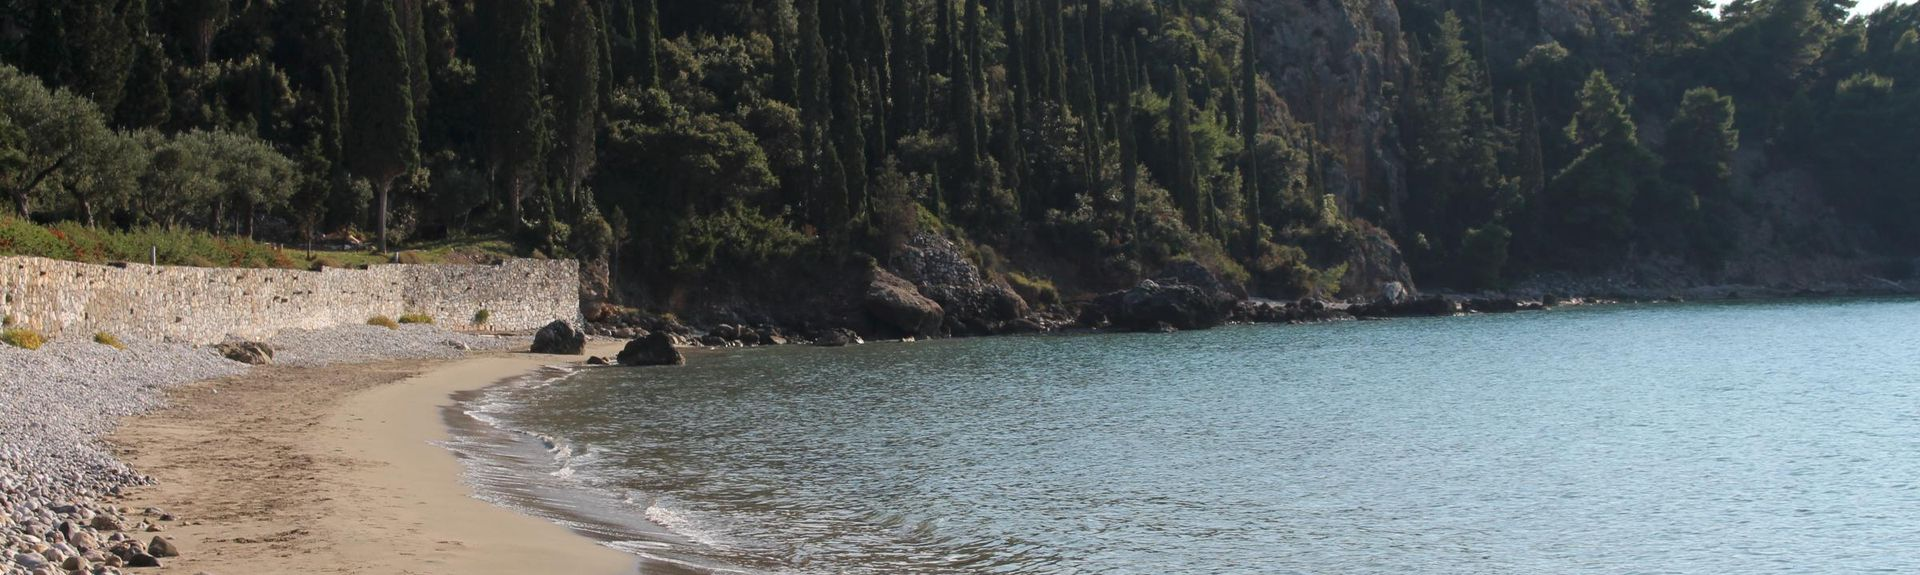 Lefktro, West Mani, Peloponeso, Grecia